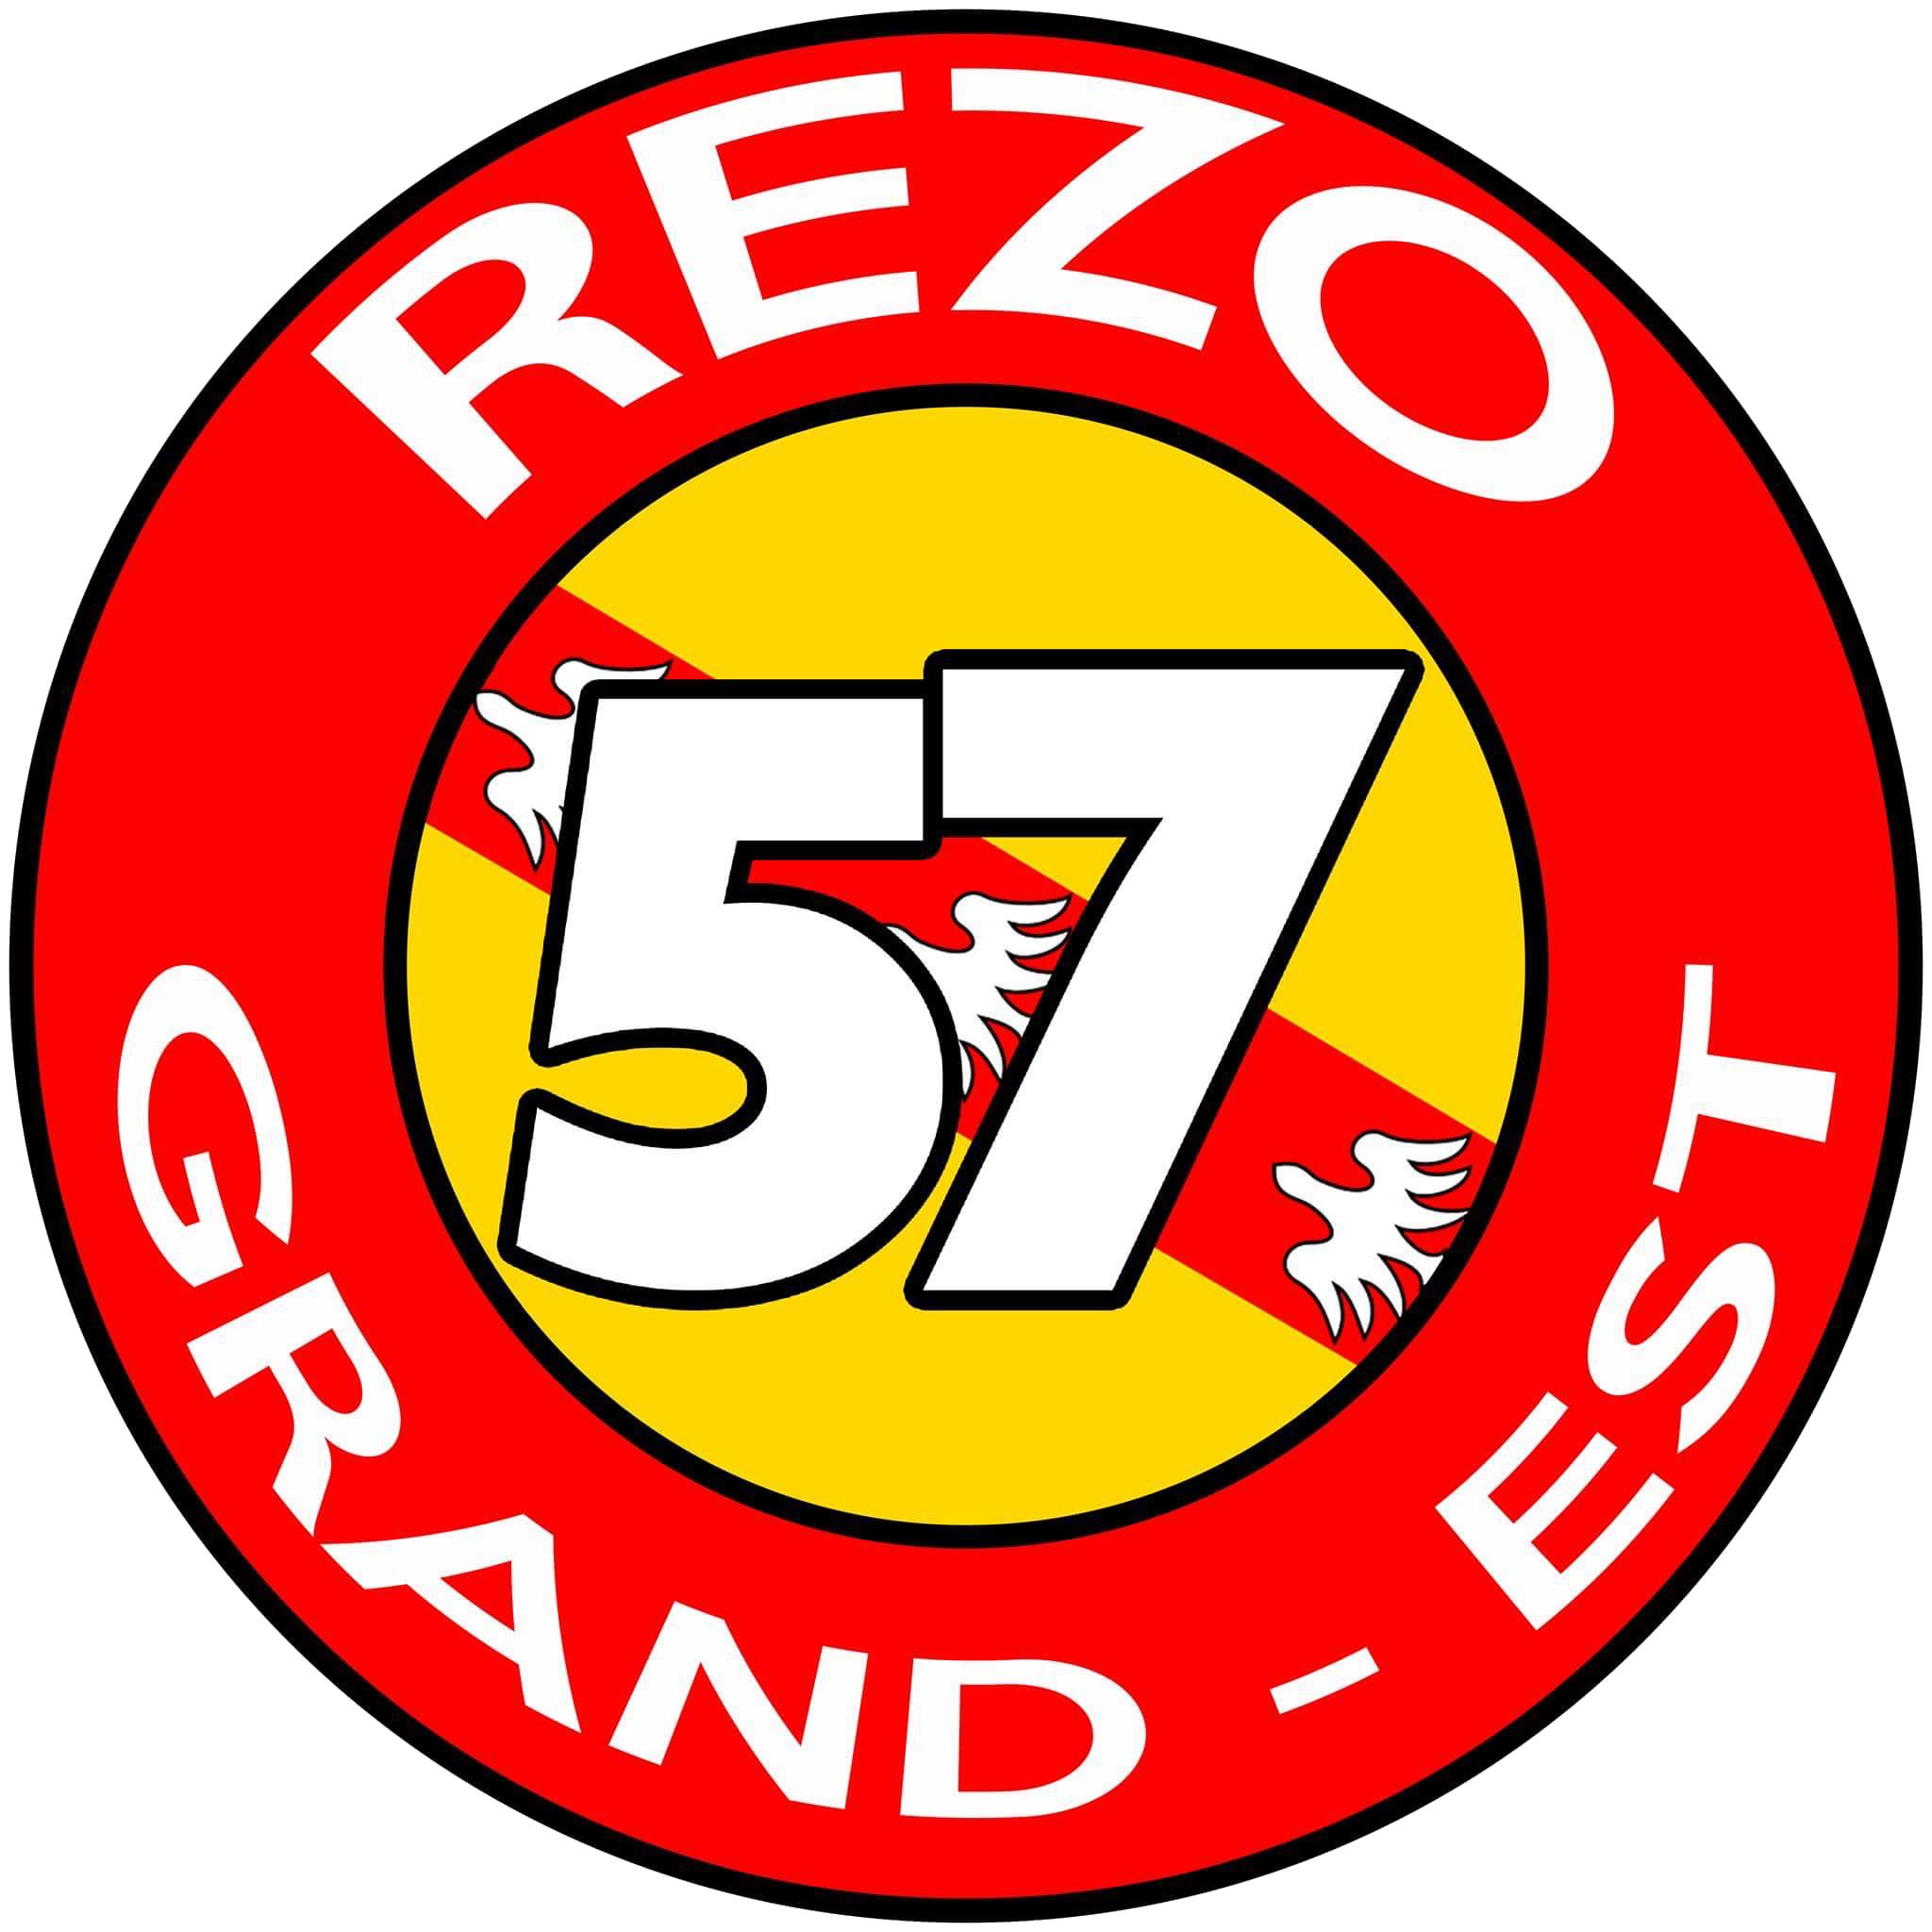 Rezo57